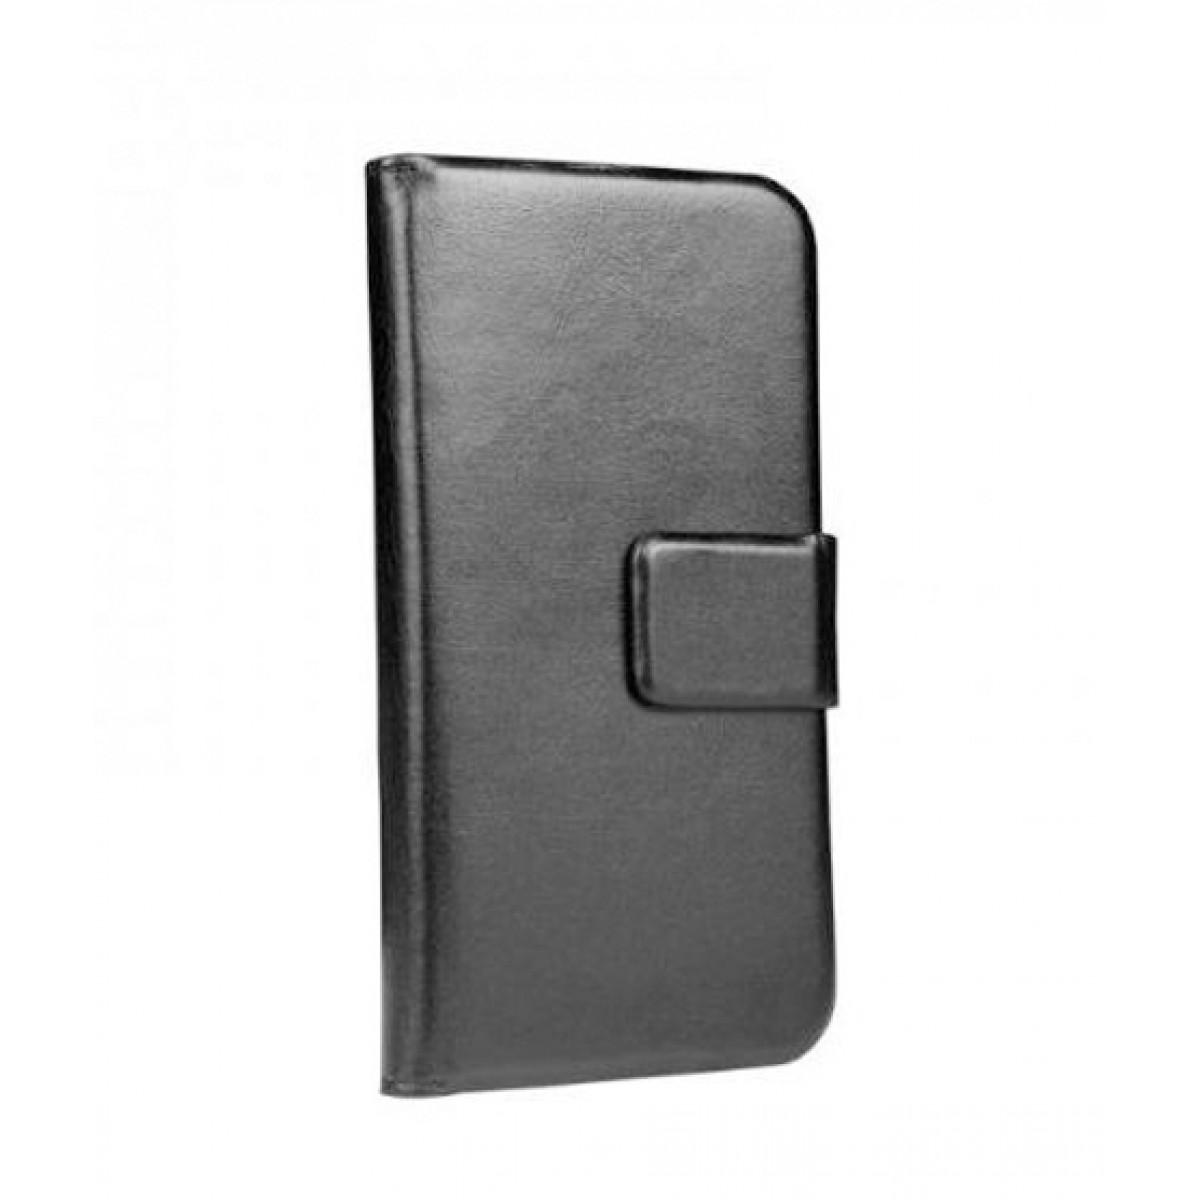 size 40 f2827 3ba97 Targus Sena Magia Wallet Black Cover For iPhone 5 (TFD010AP)